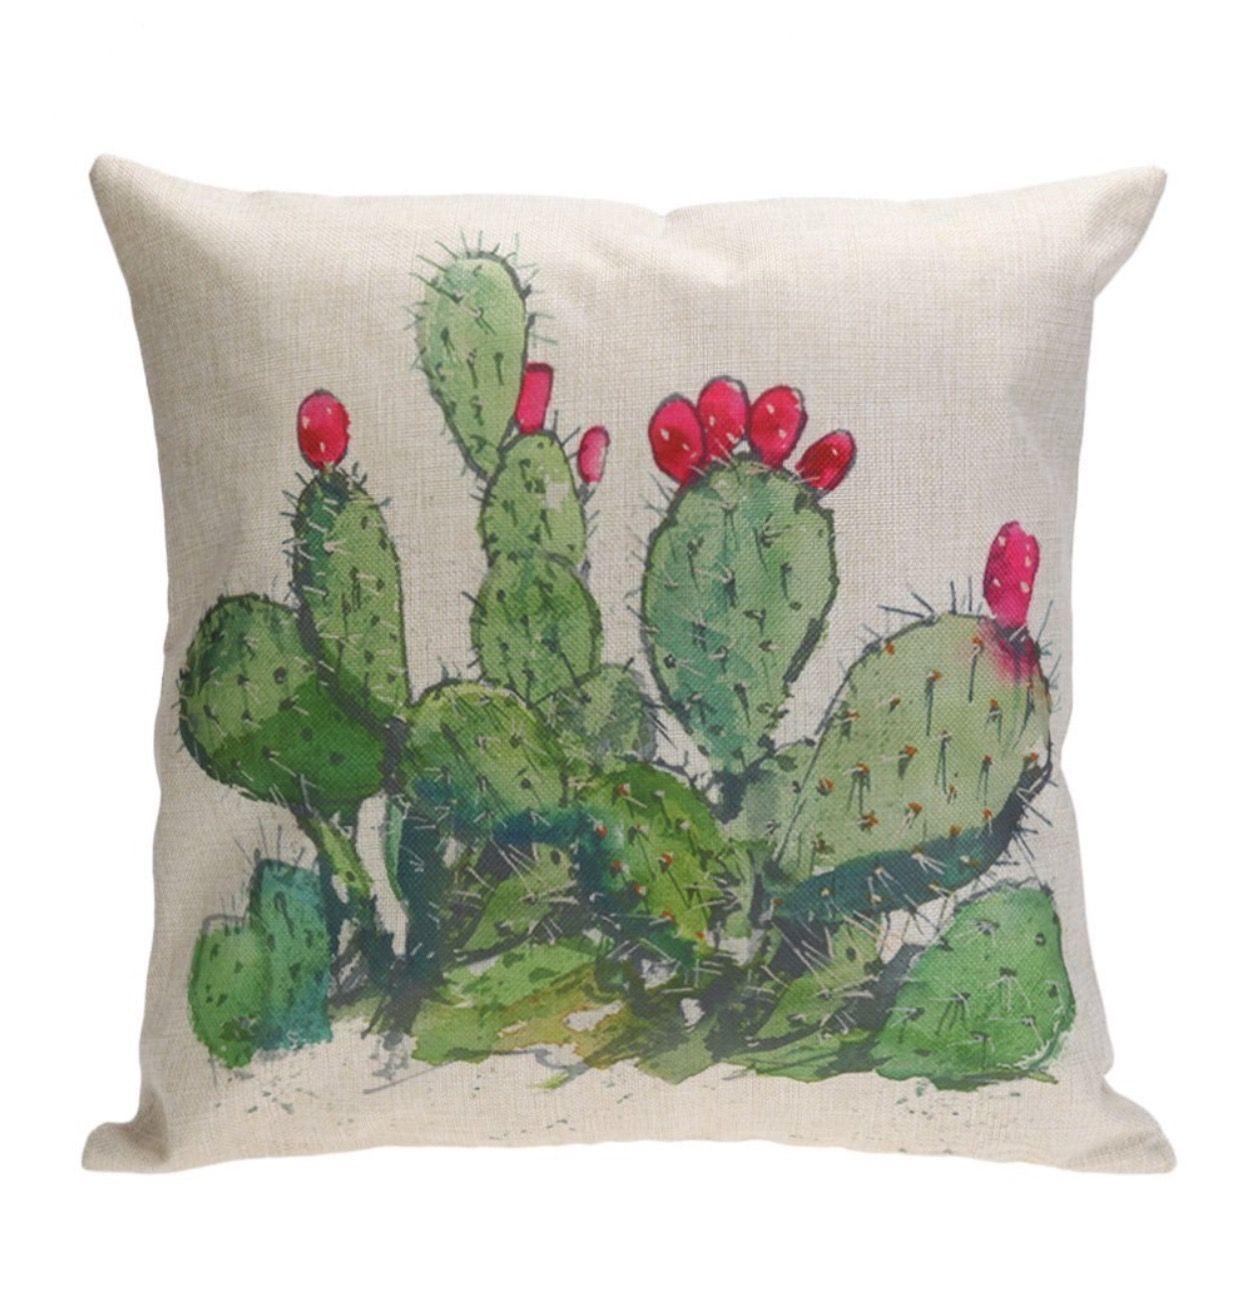 super genius diy ideas cheap decorative pillows coffee tables